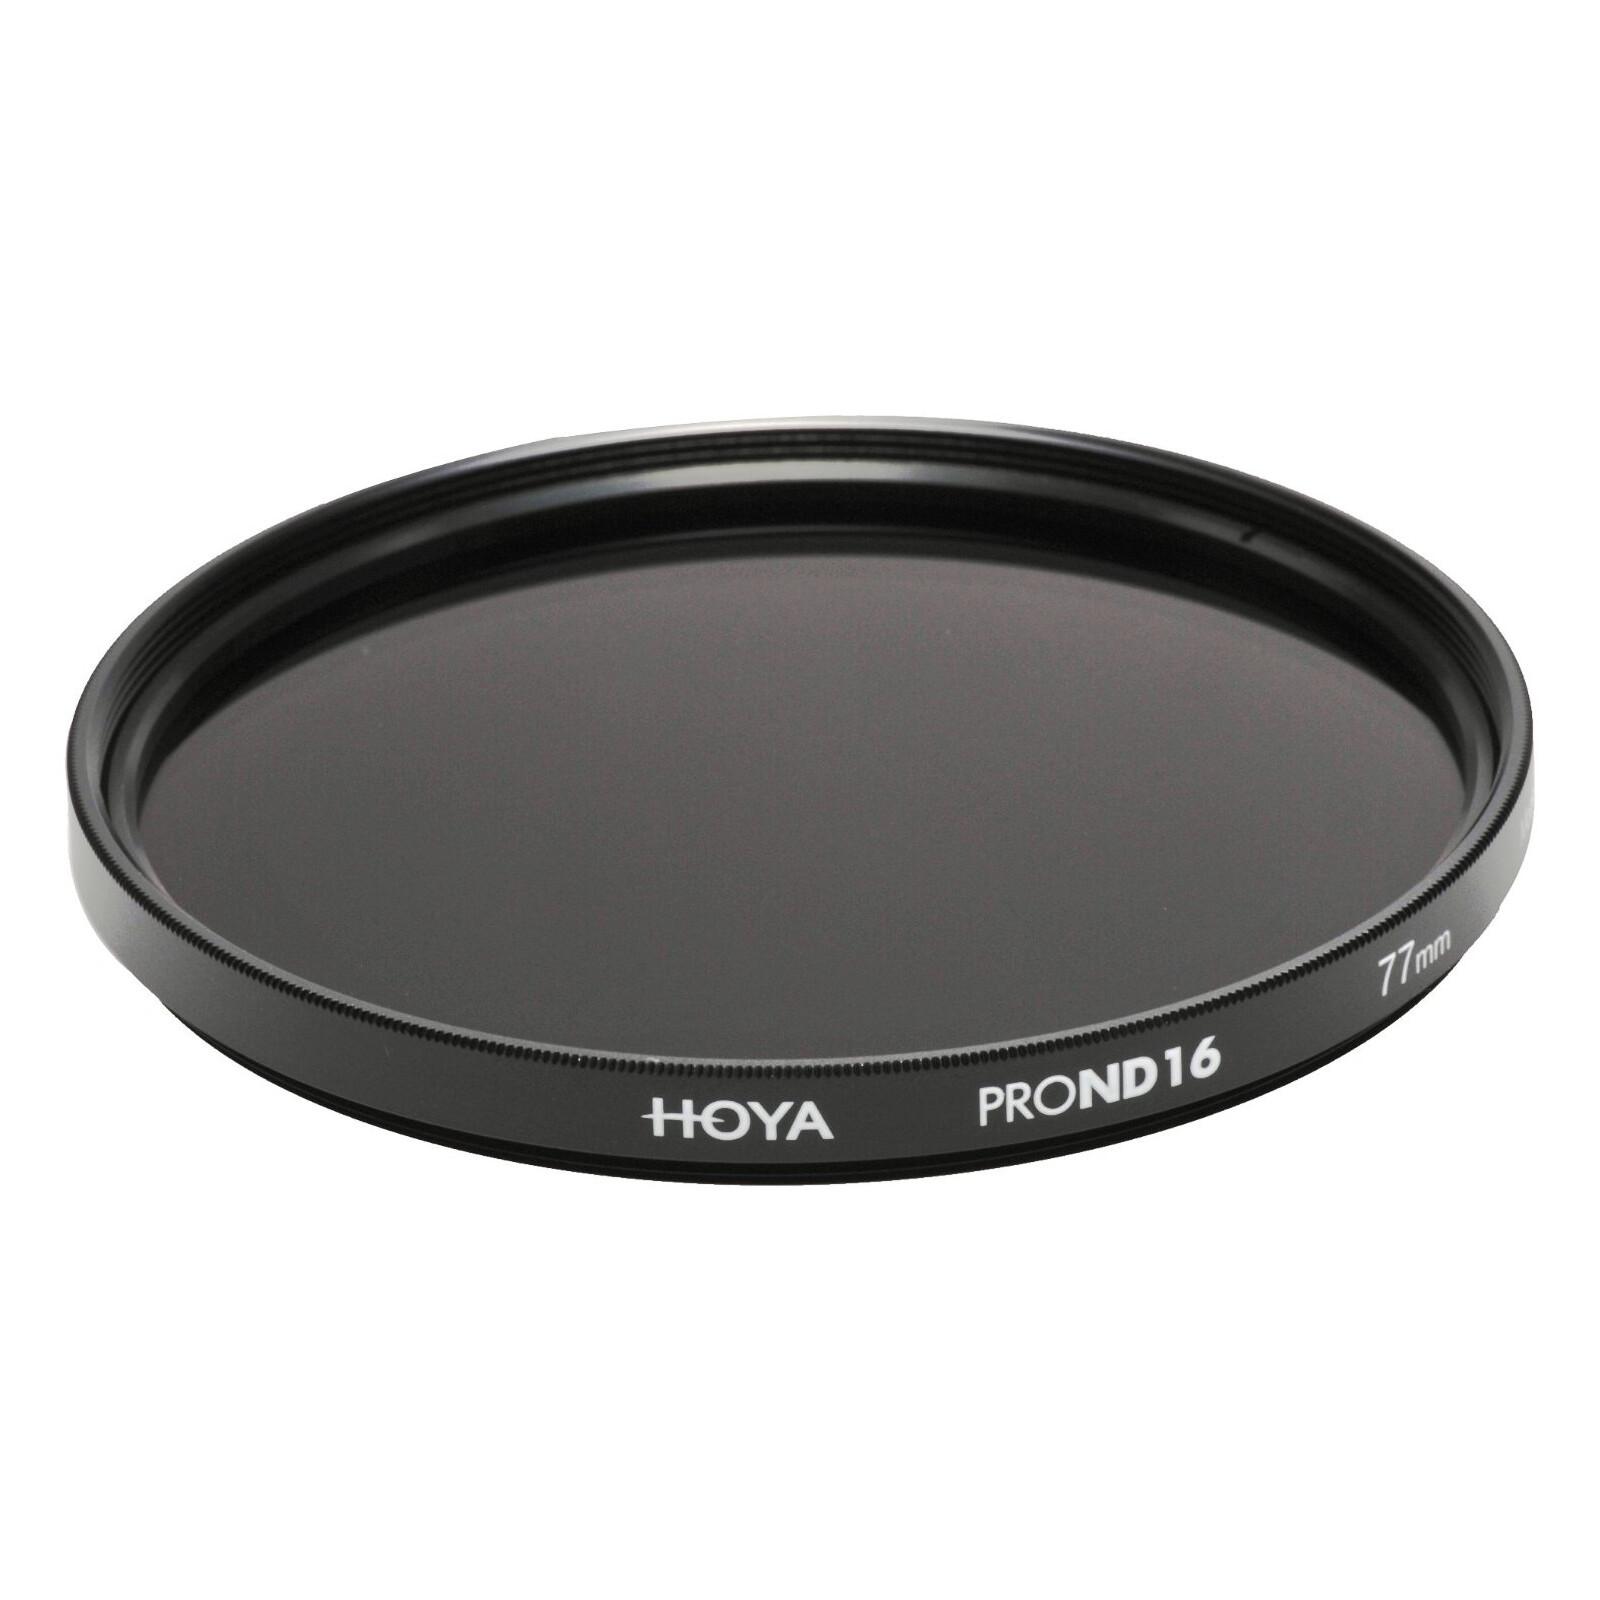 Hoya Grau PRO ND 16 67mm